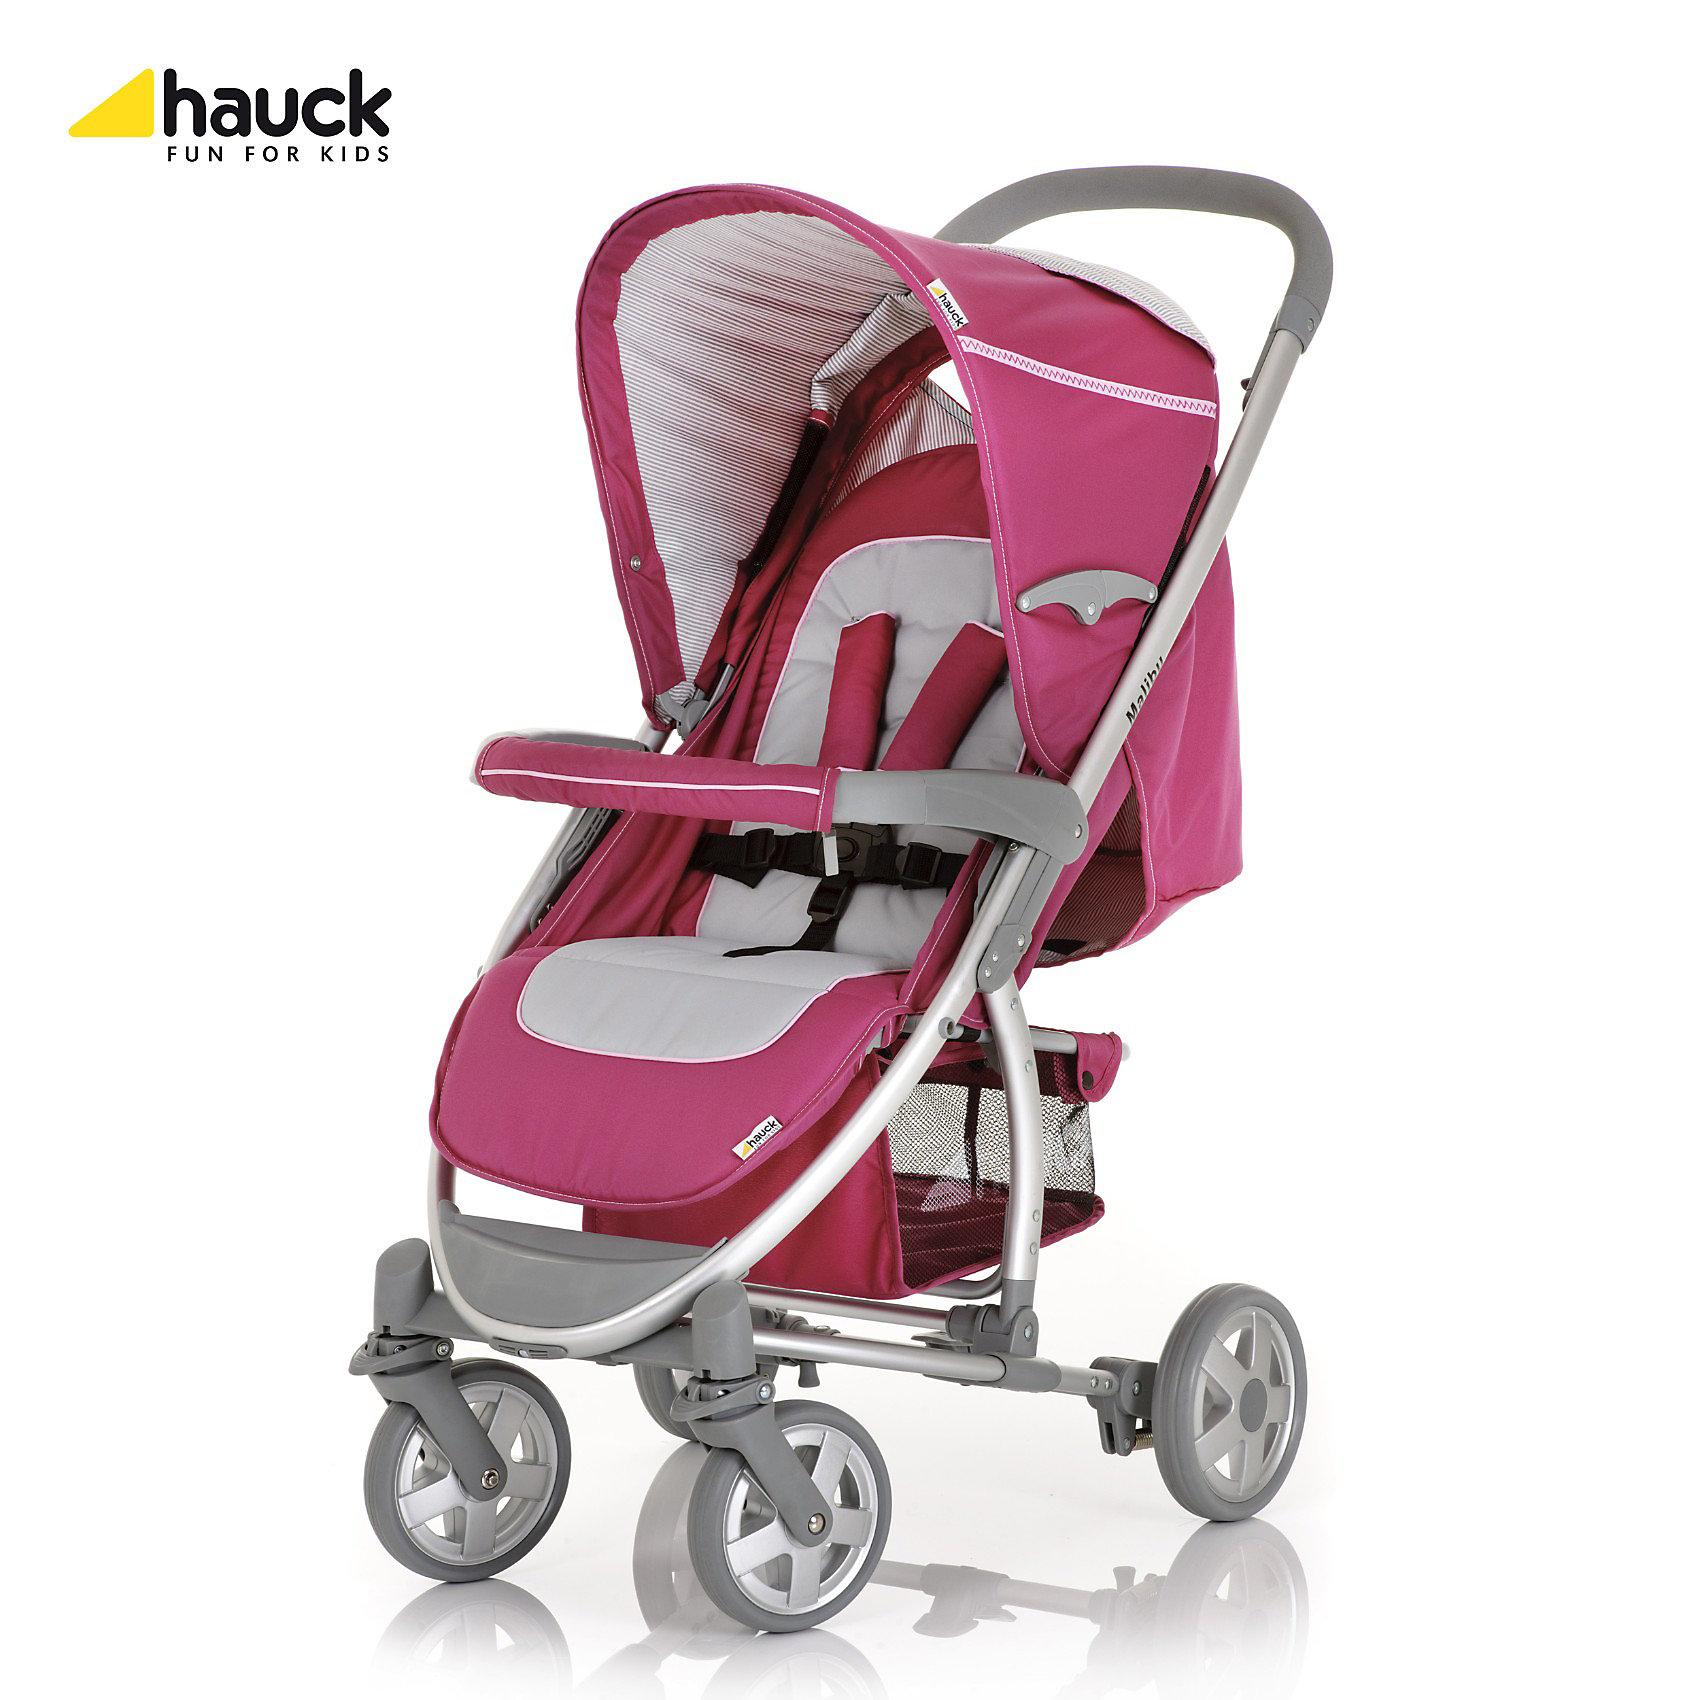 hauck Прогулочная коляска Malibu М-12, Hauck, violett hauck citi